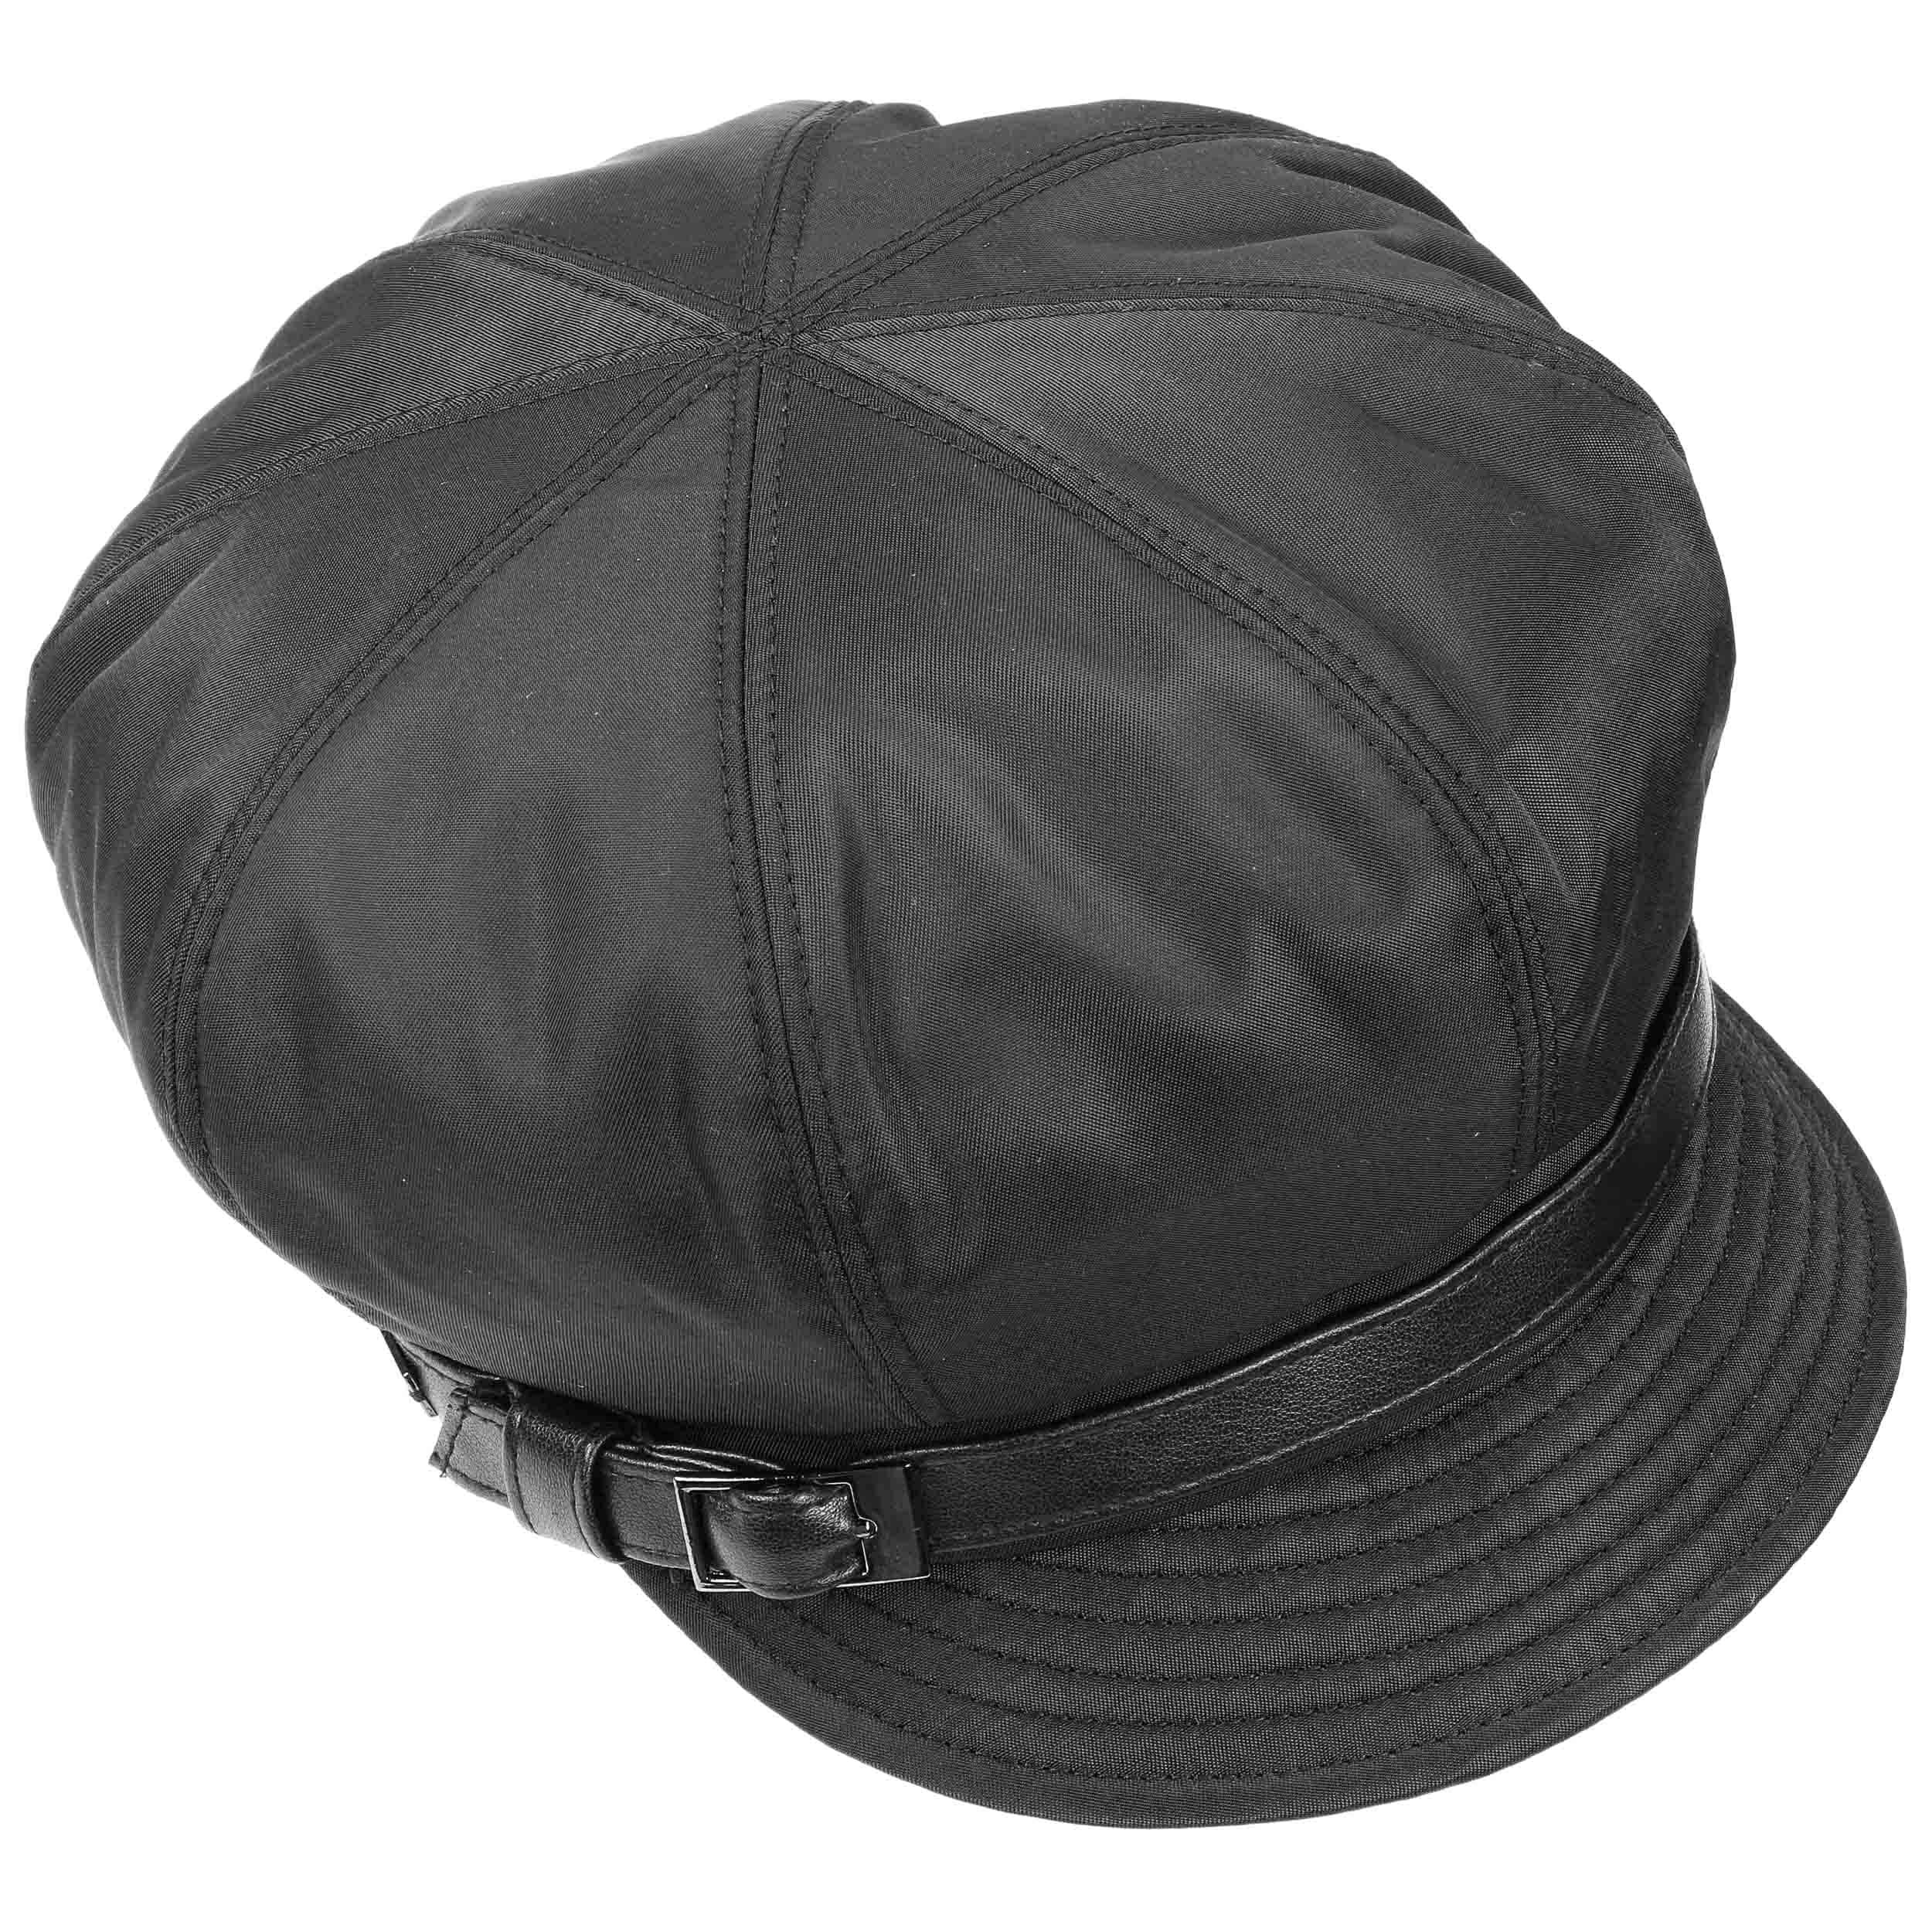 ... Fern Women´s Newsboy Cap by Betmar - black 1 ... 12aa55df5630